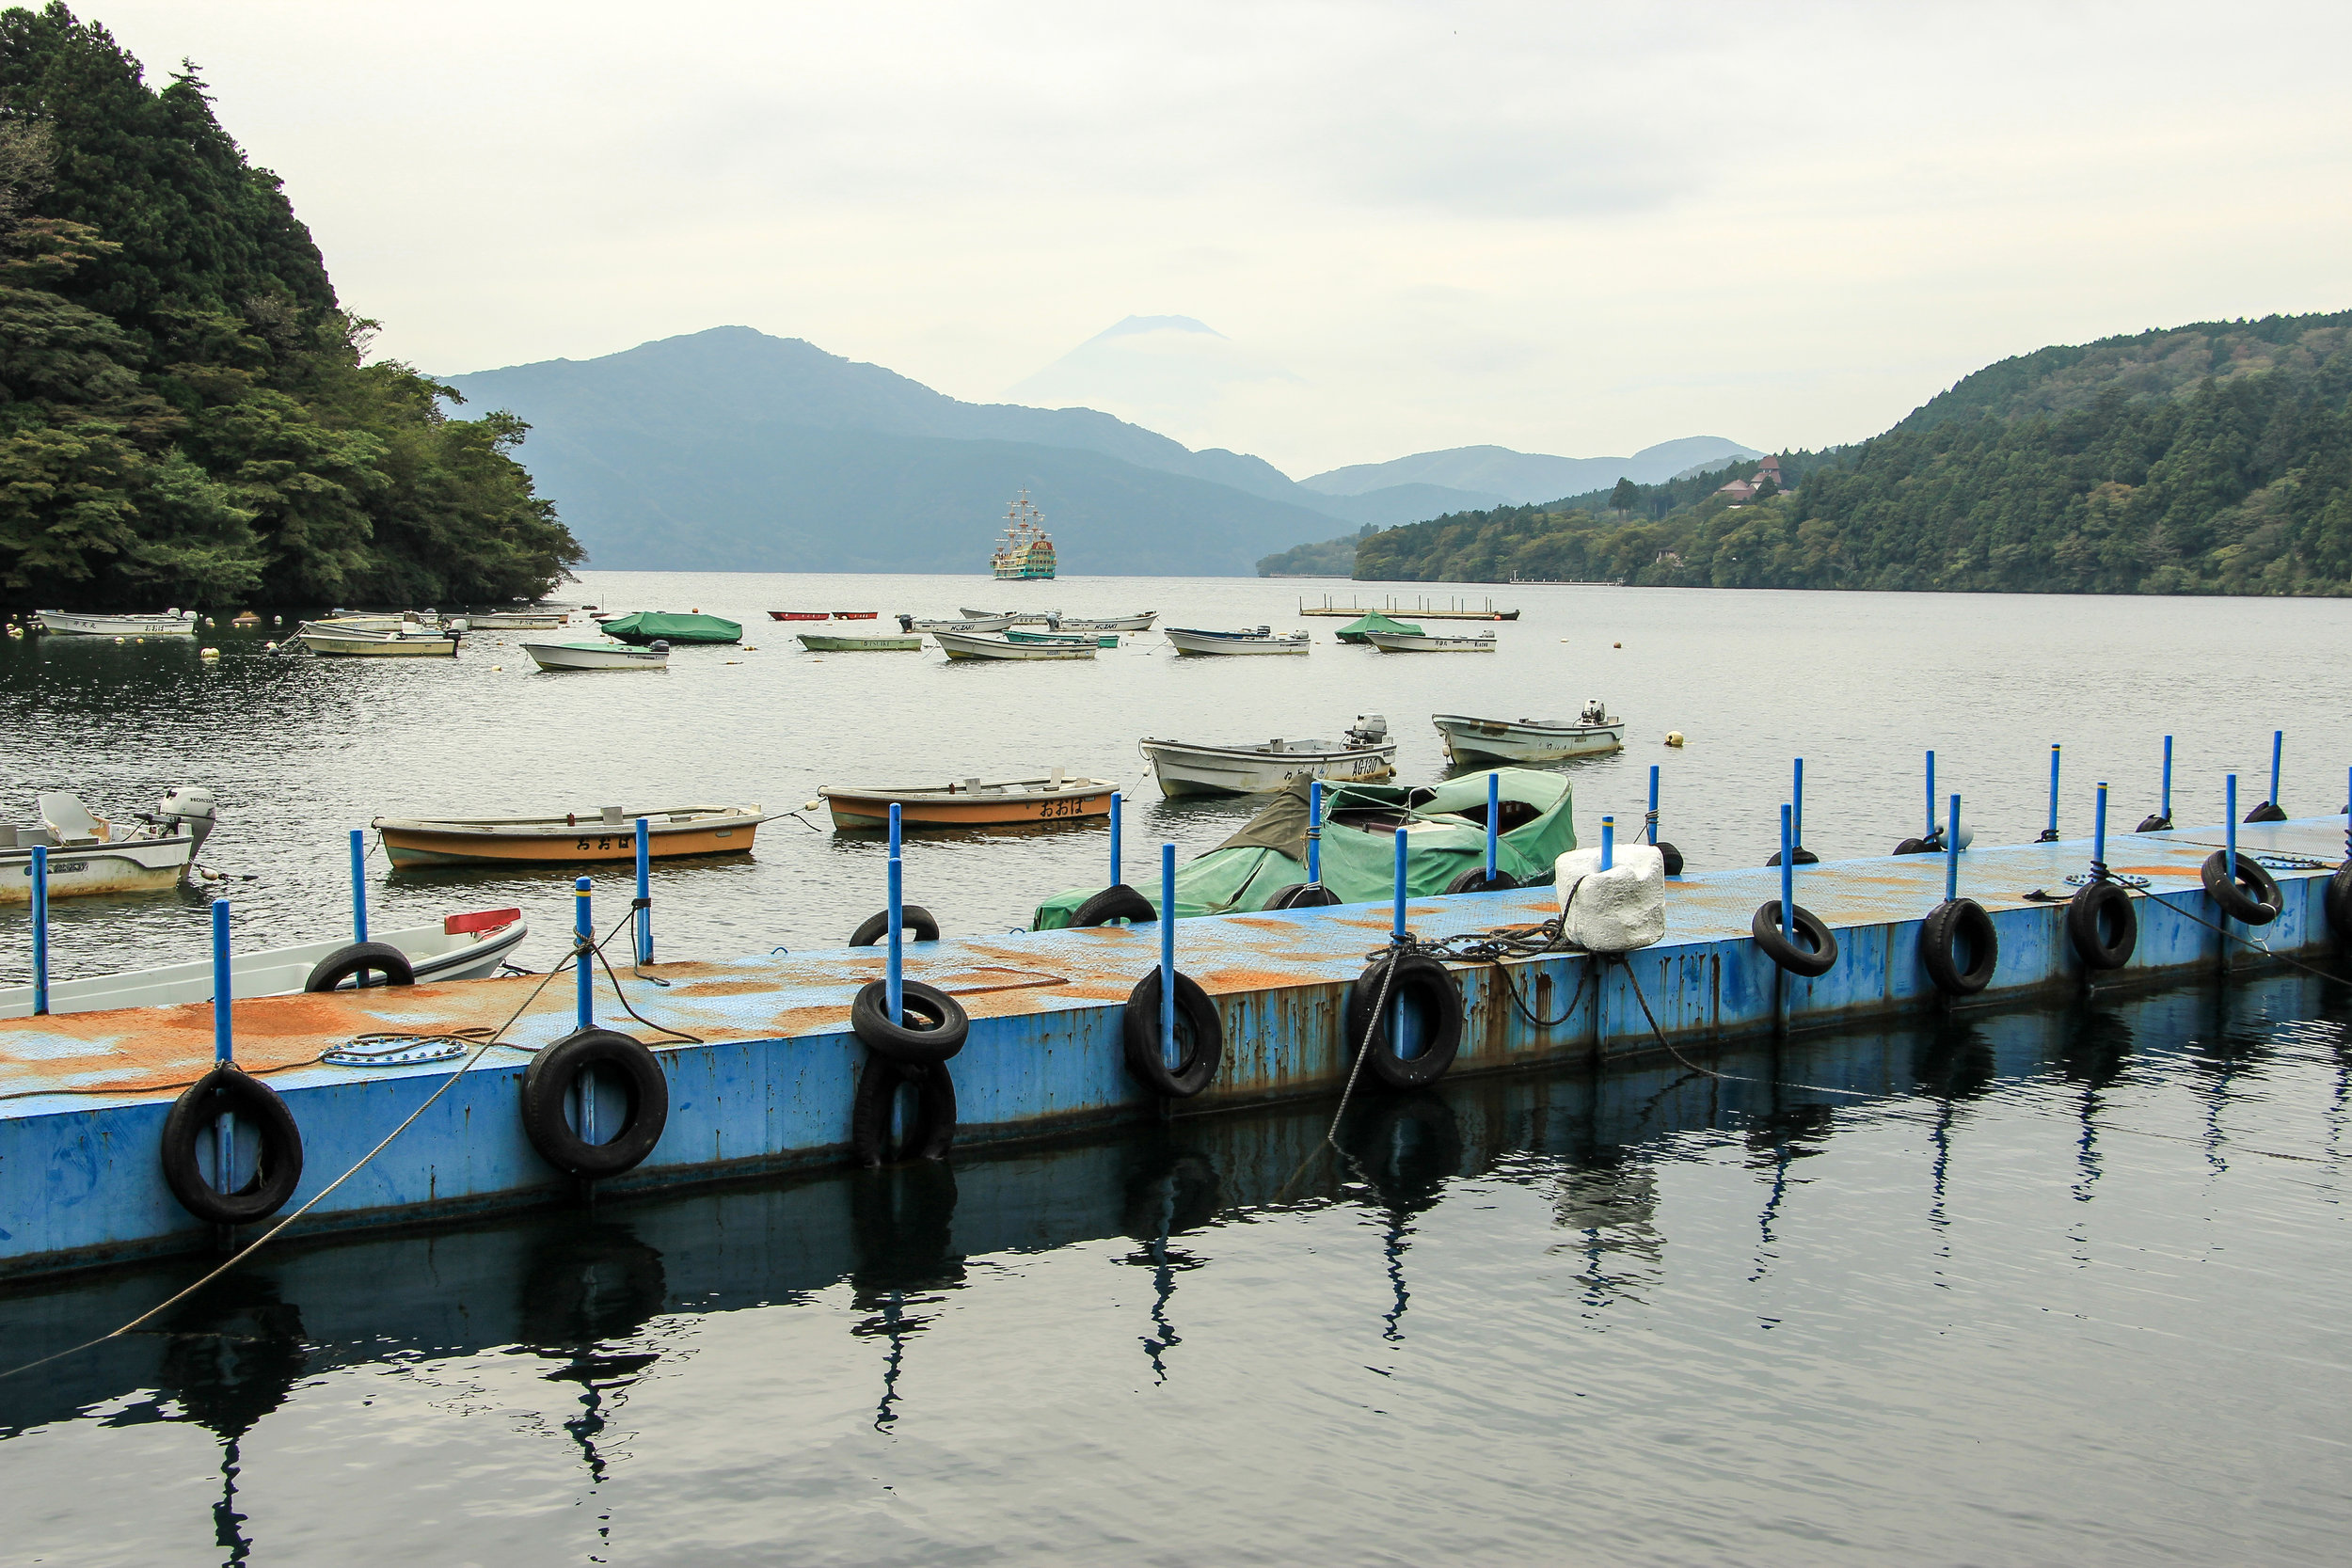 Hakone In A Simple Way Like That | Lake Ashi, Mount Fuji, Hakone | Fuji-Hakone-Izu National Park, Japan, Asia | DoLessGetMoreDone.com |